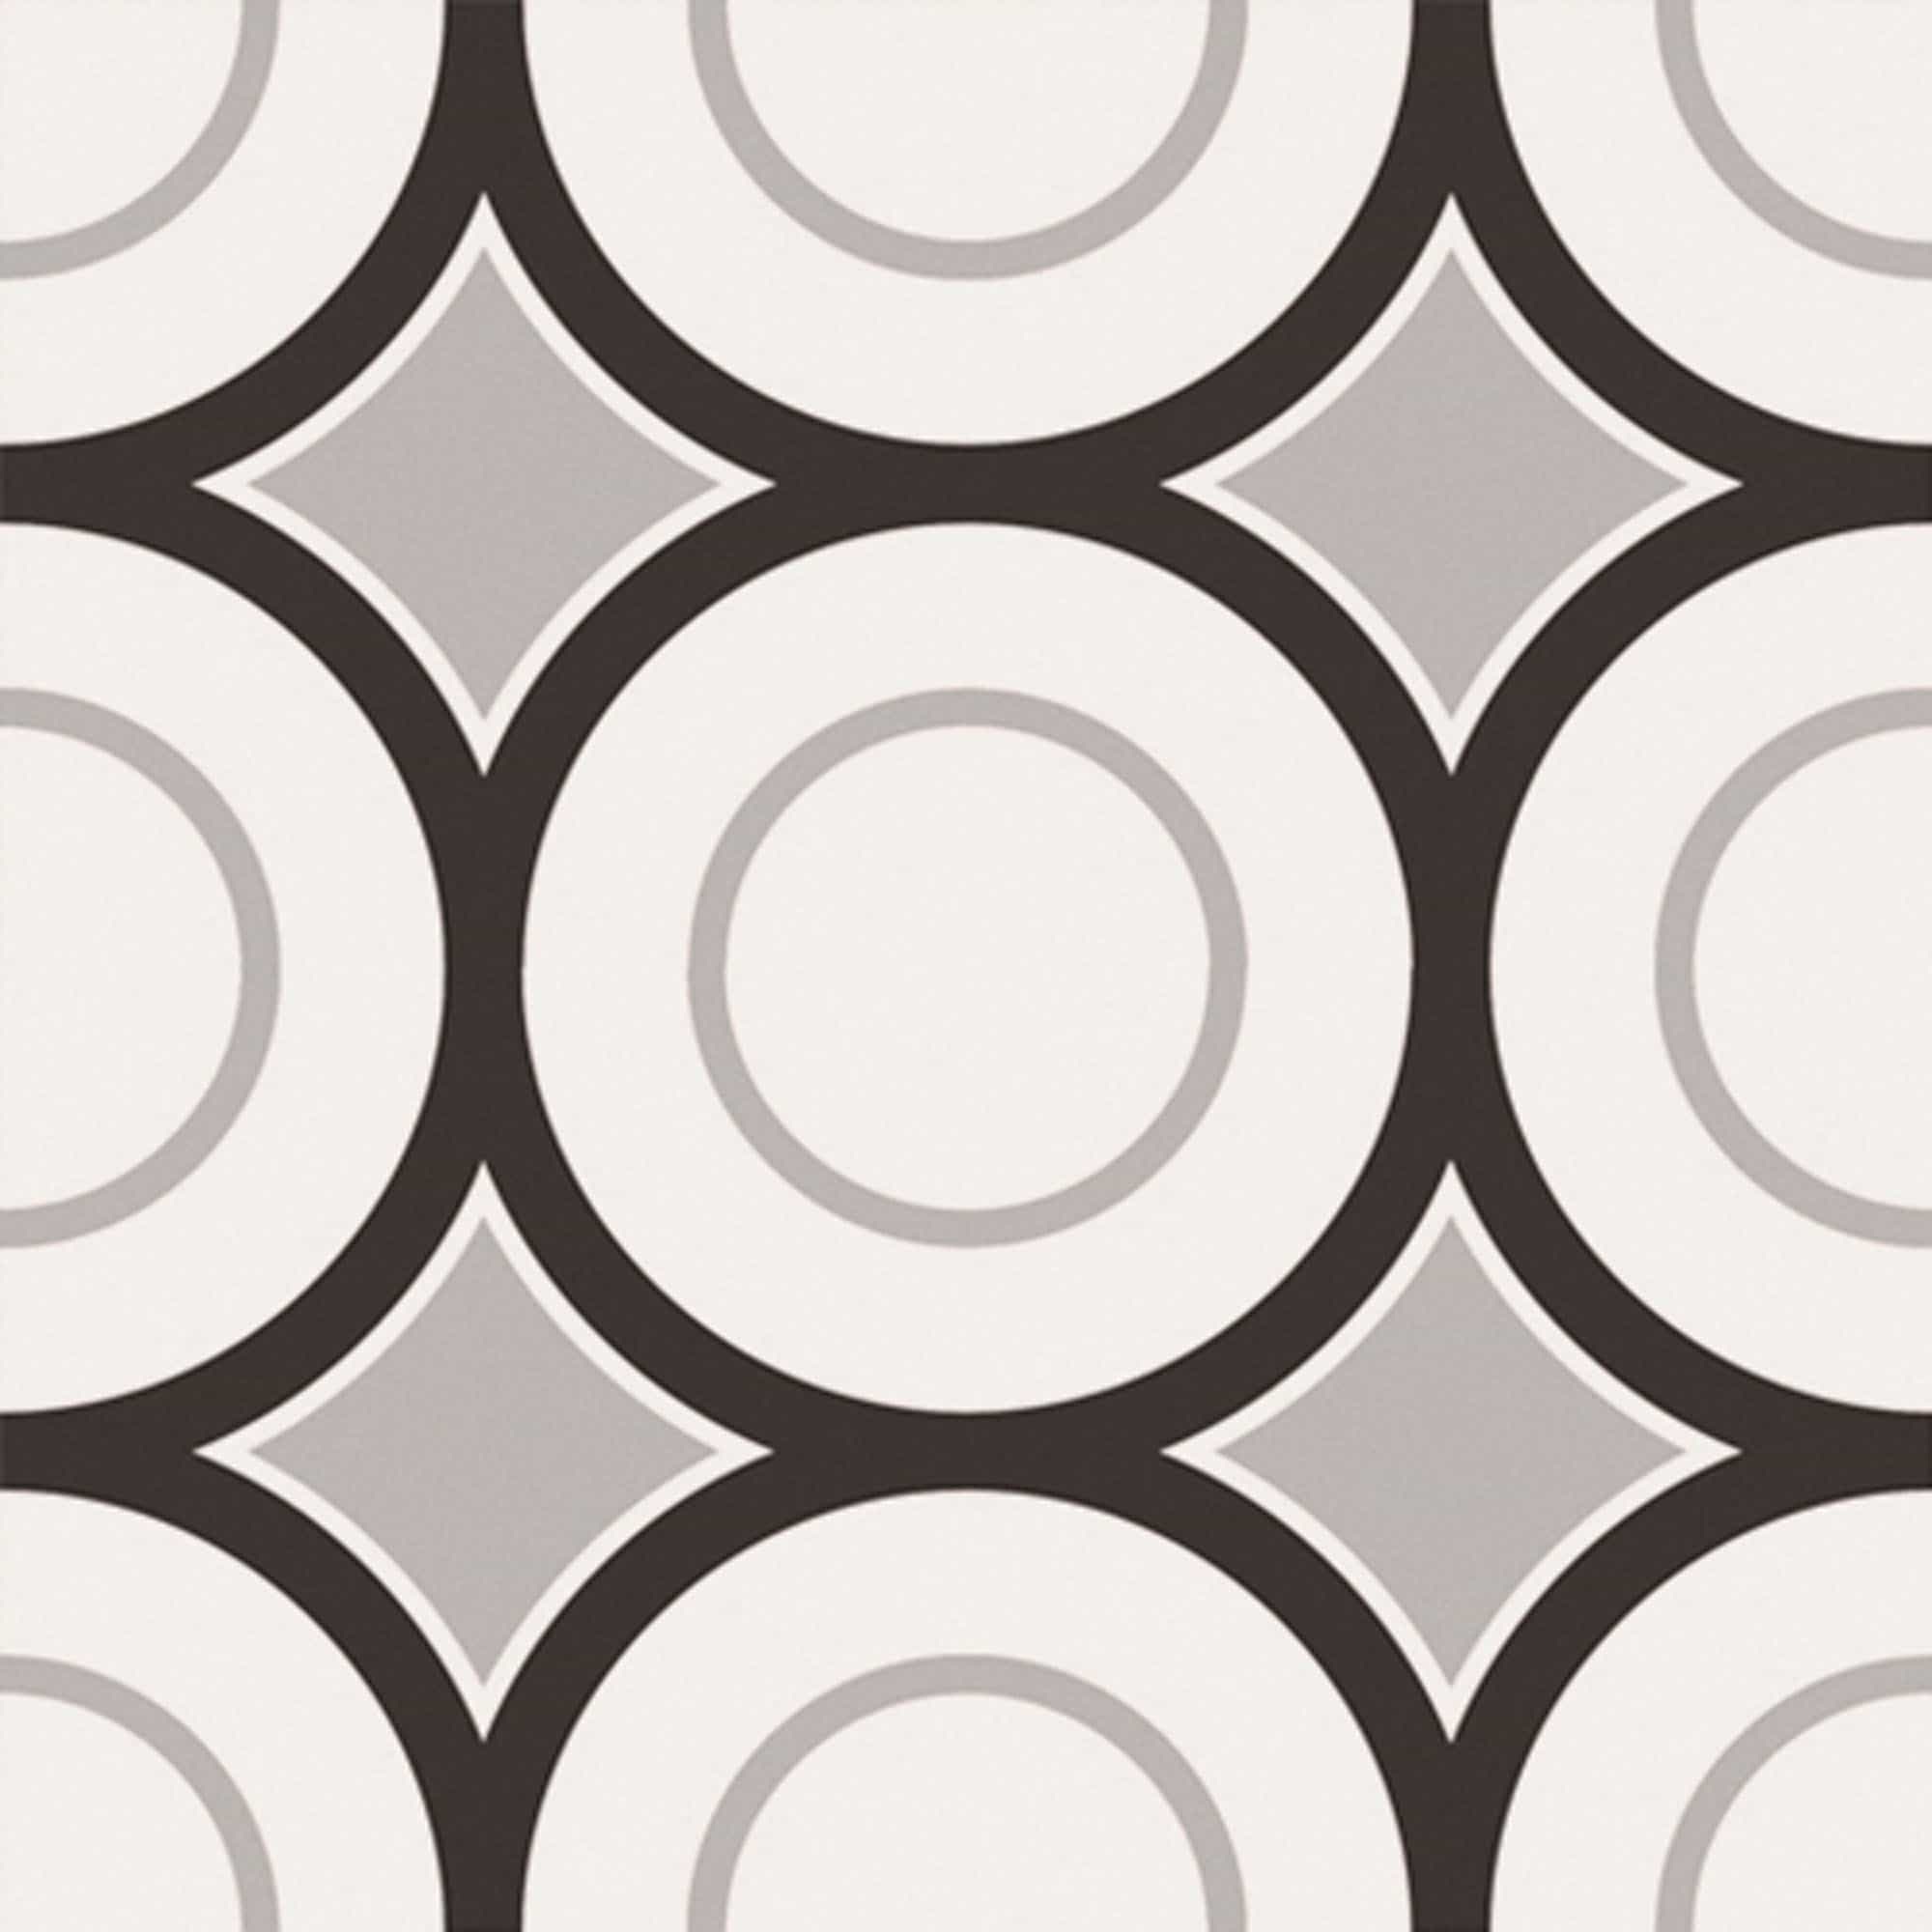 Vloertegels patroon - Patchwork Black & White 05